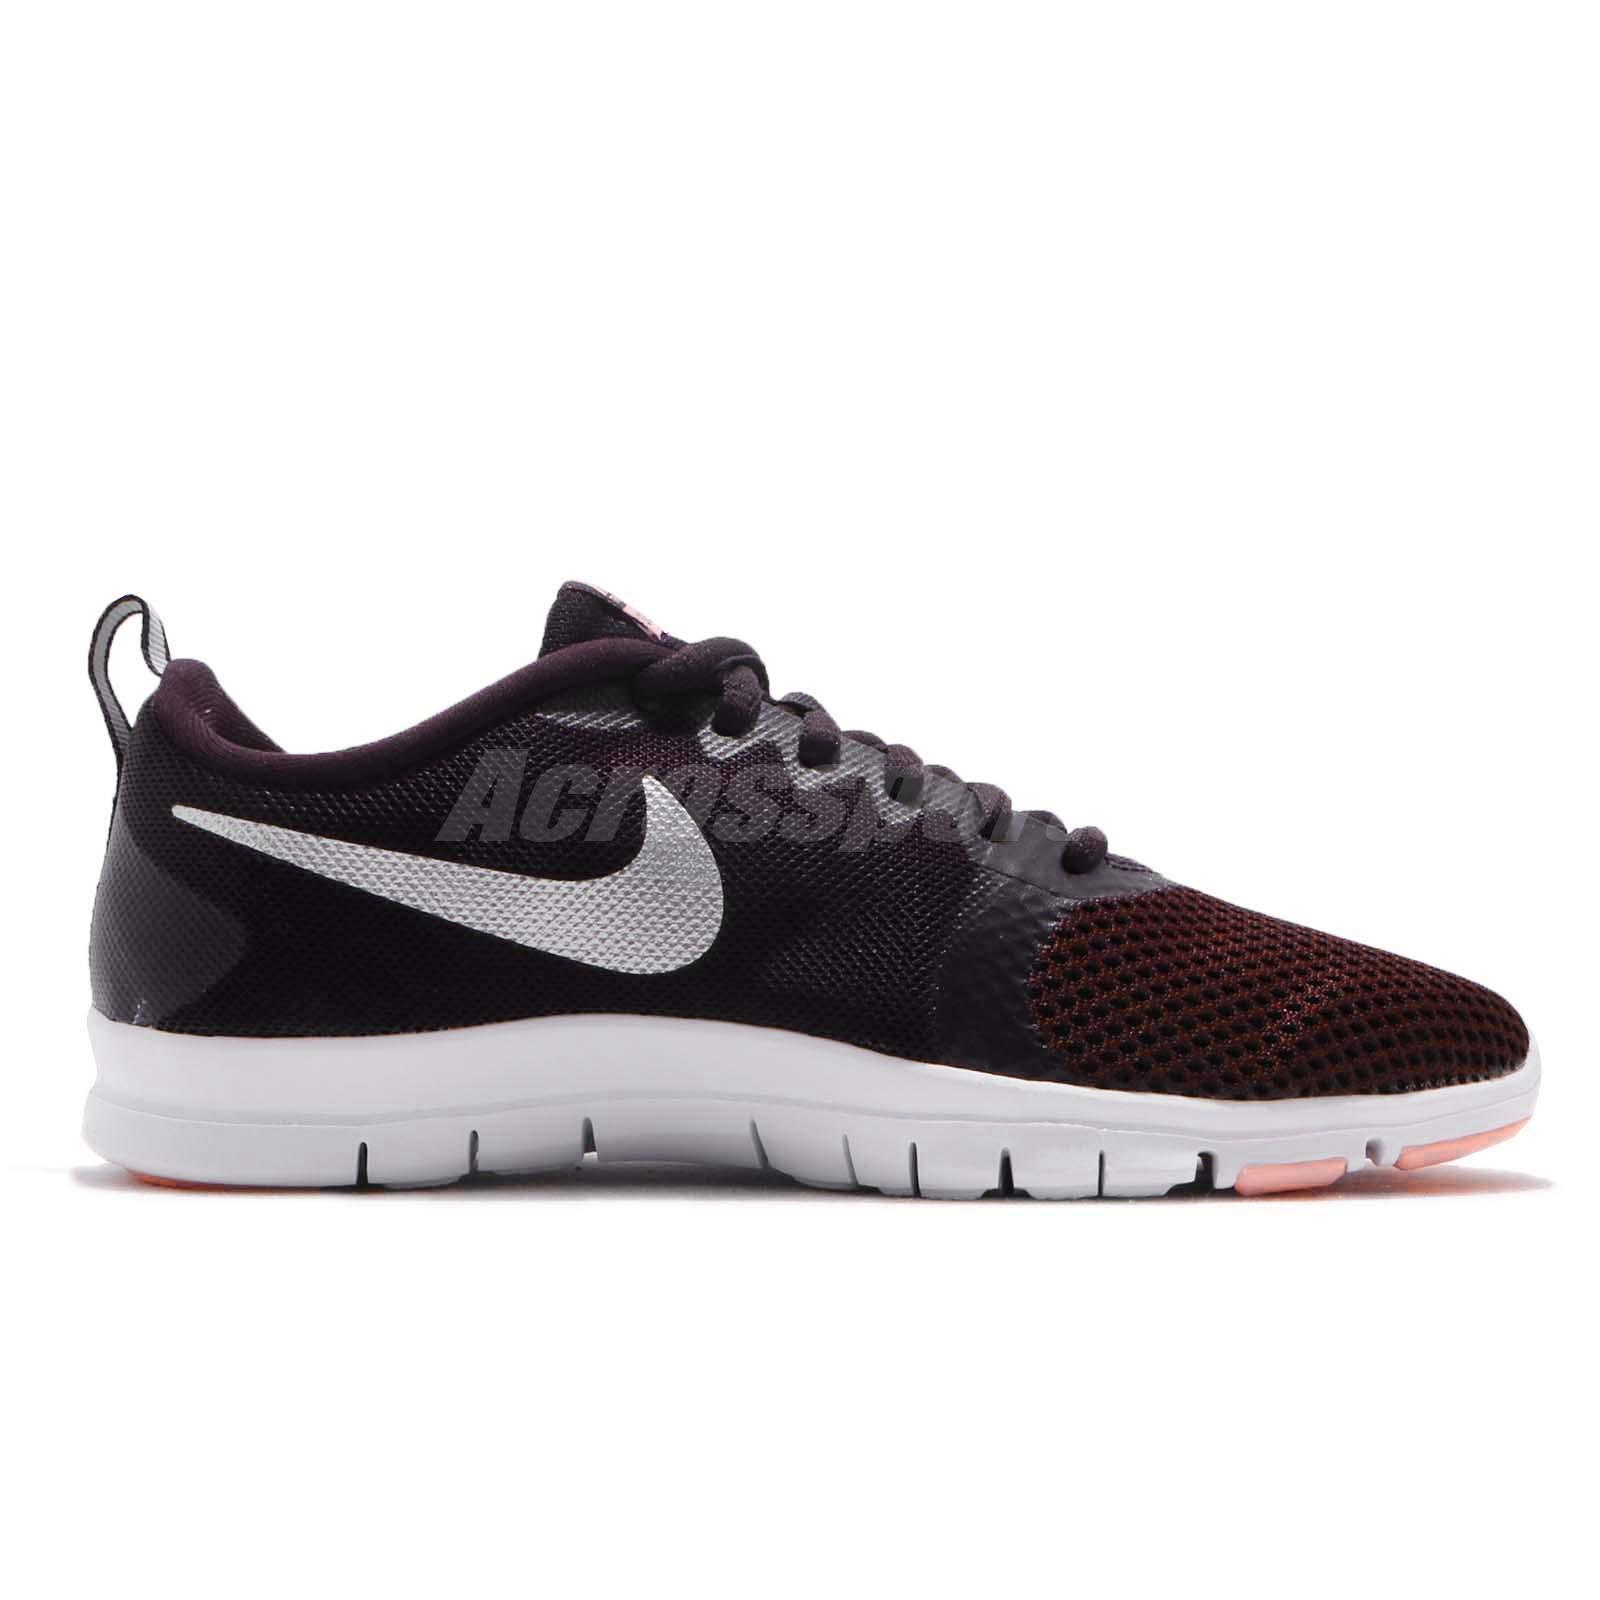 ca36bc2381 Nike Wmns Flex Essential TR Burgundy Ash Women Cross Training Shoes ...